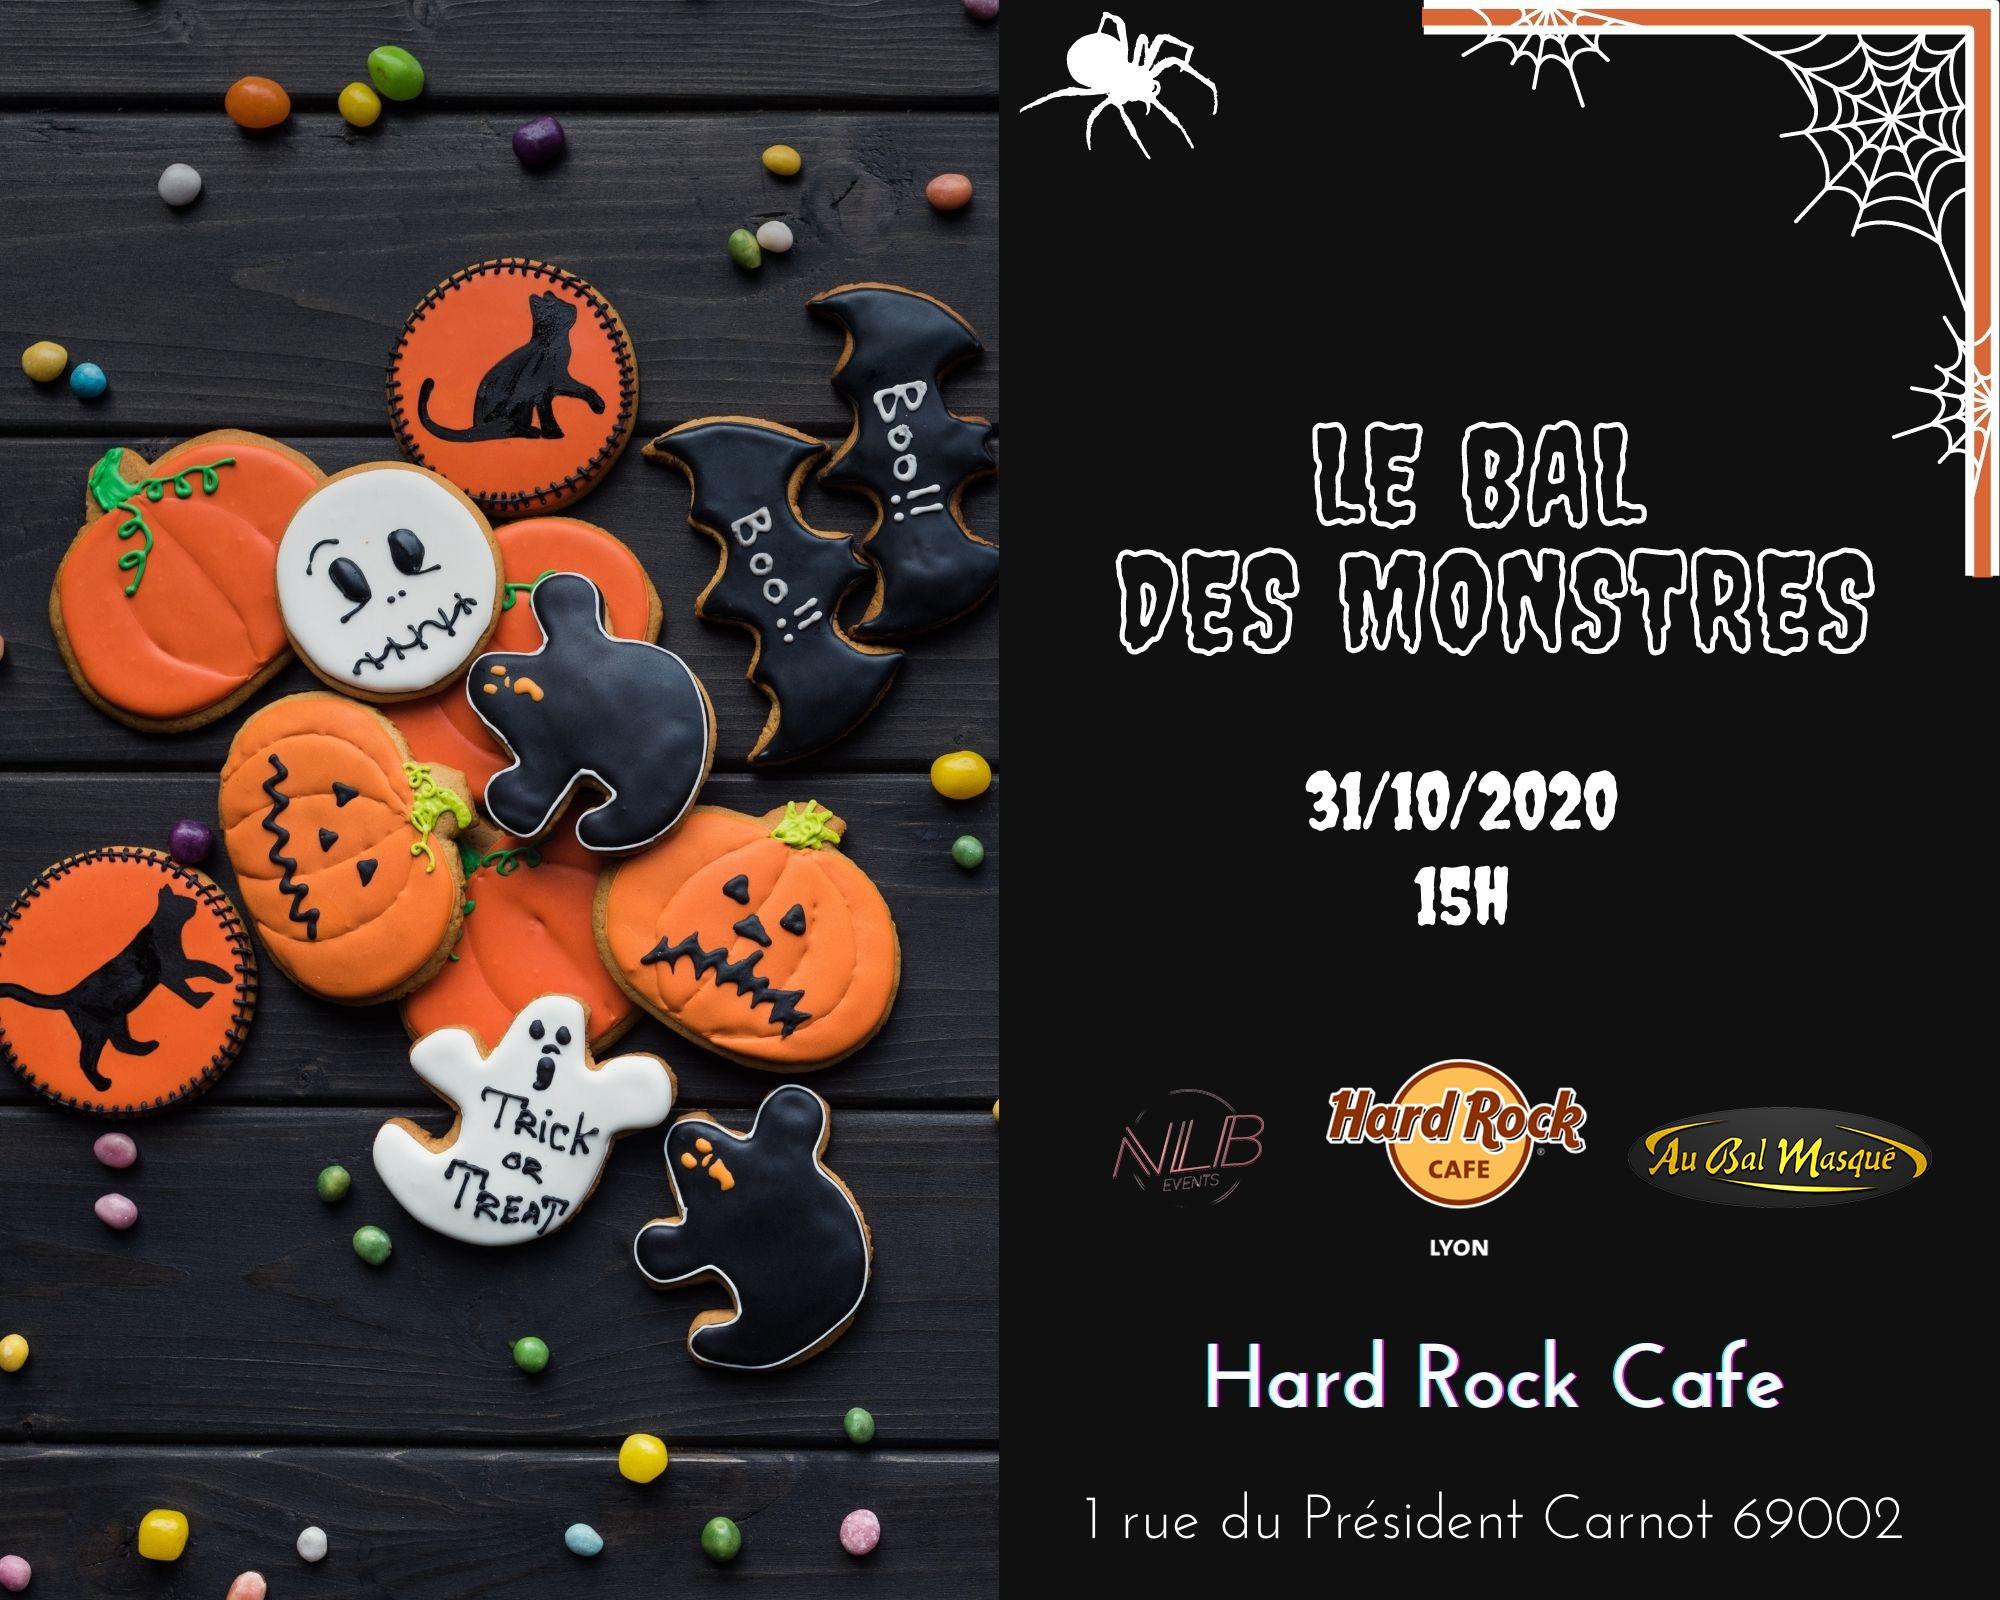 Bal des monstres Hard Rock café Lyon